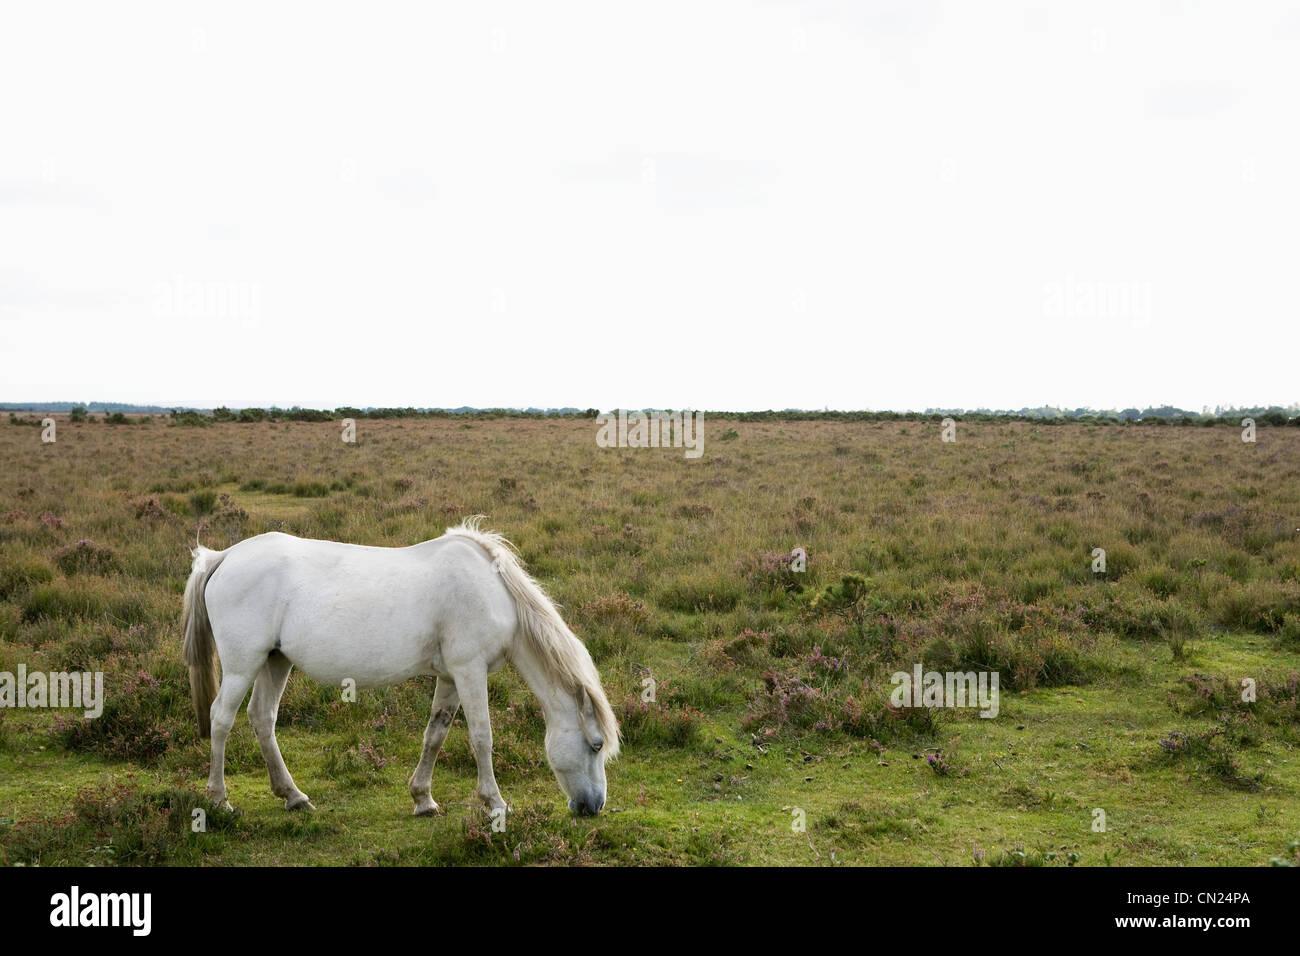 Wild horse grazing - Stock Image